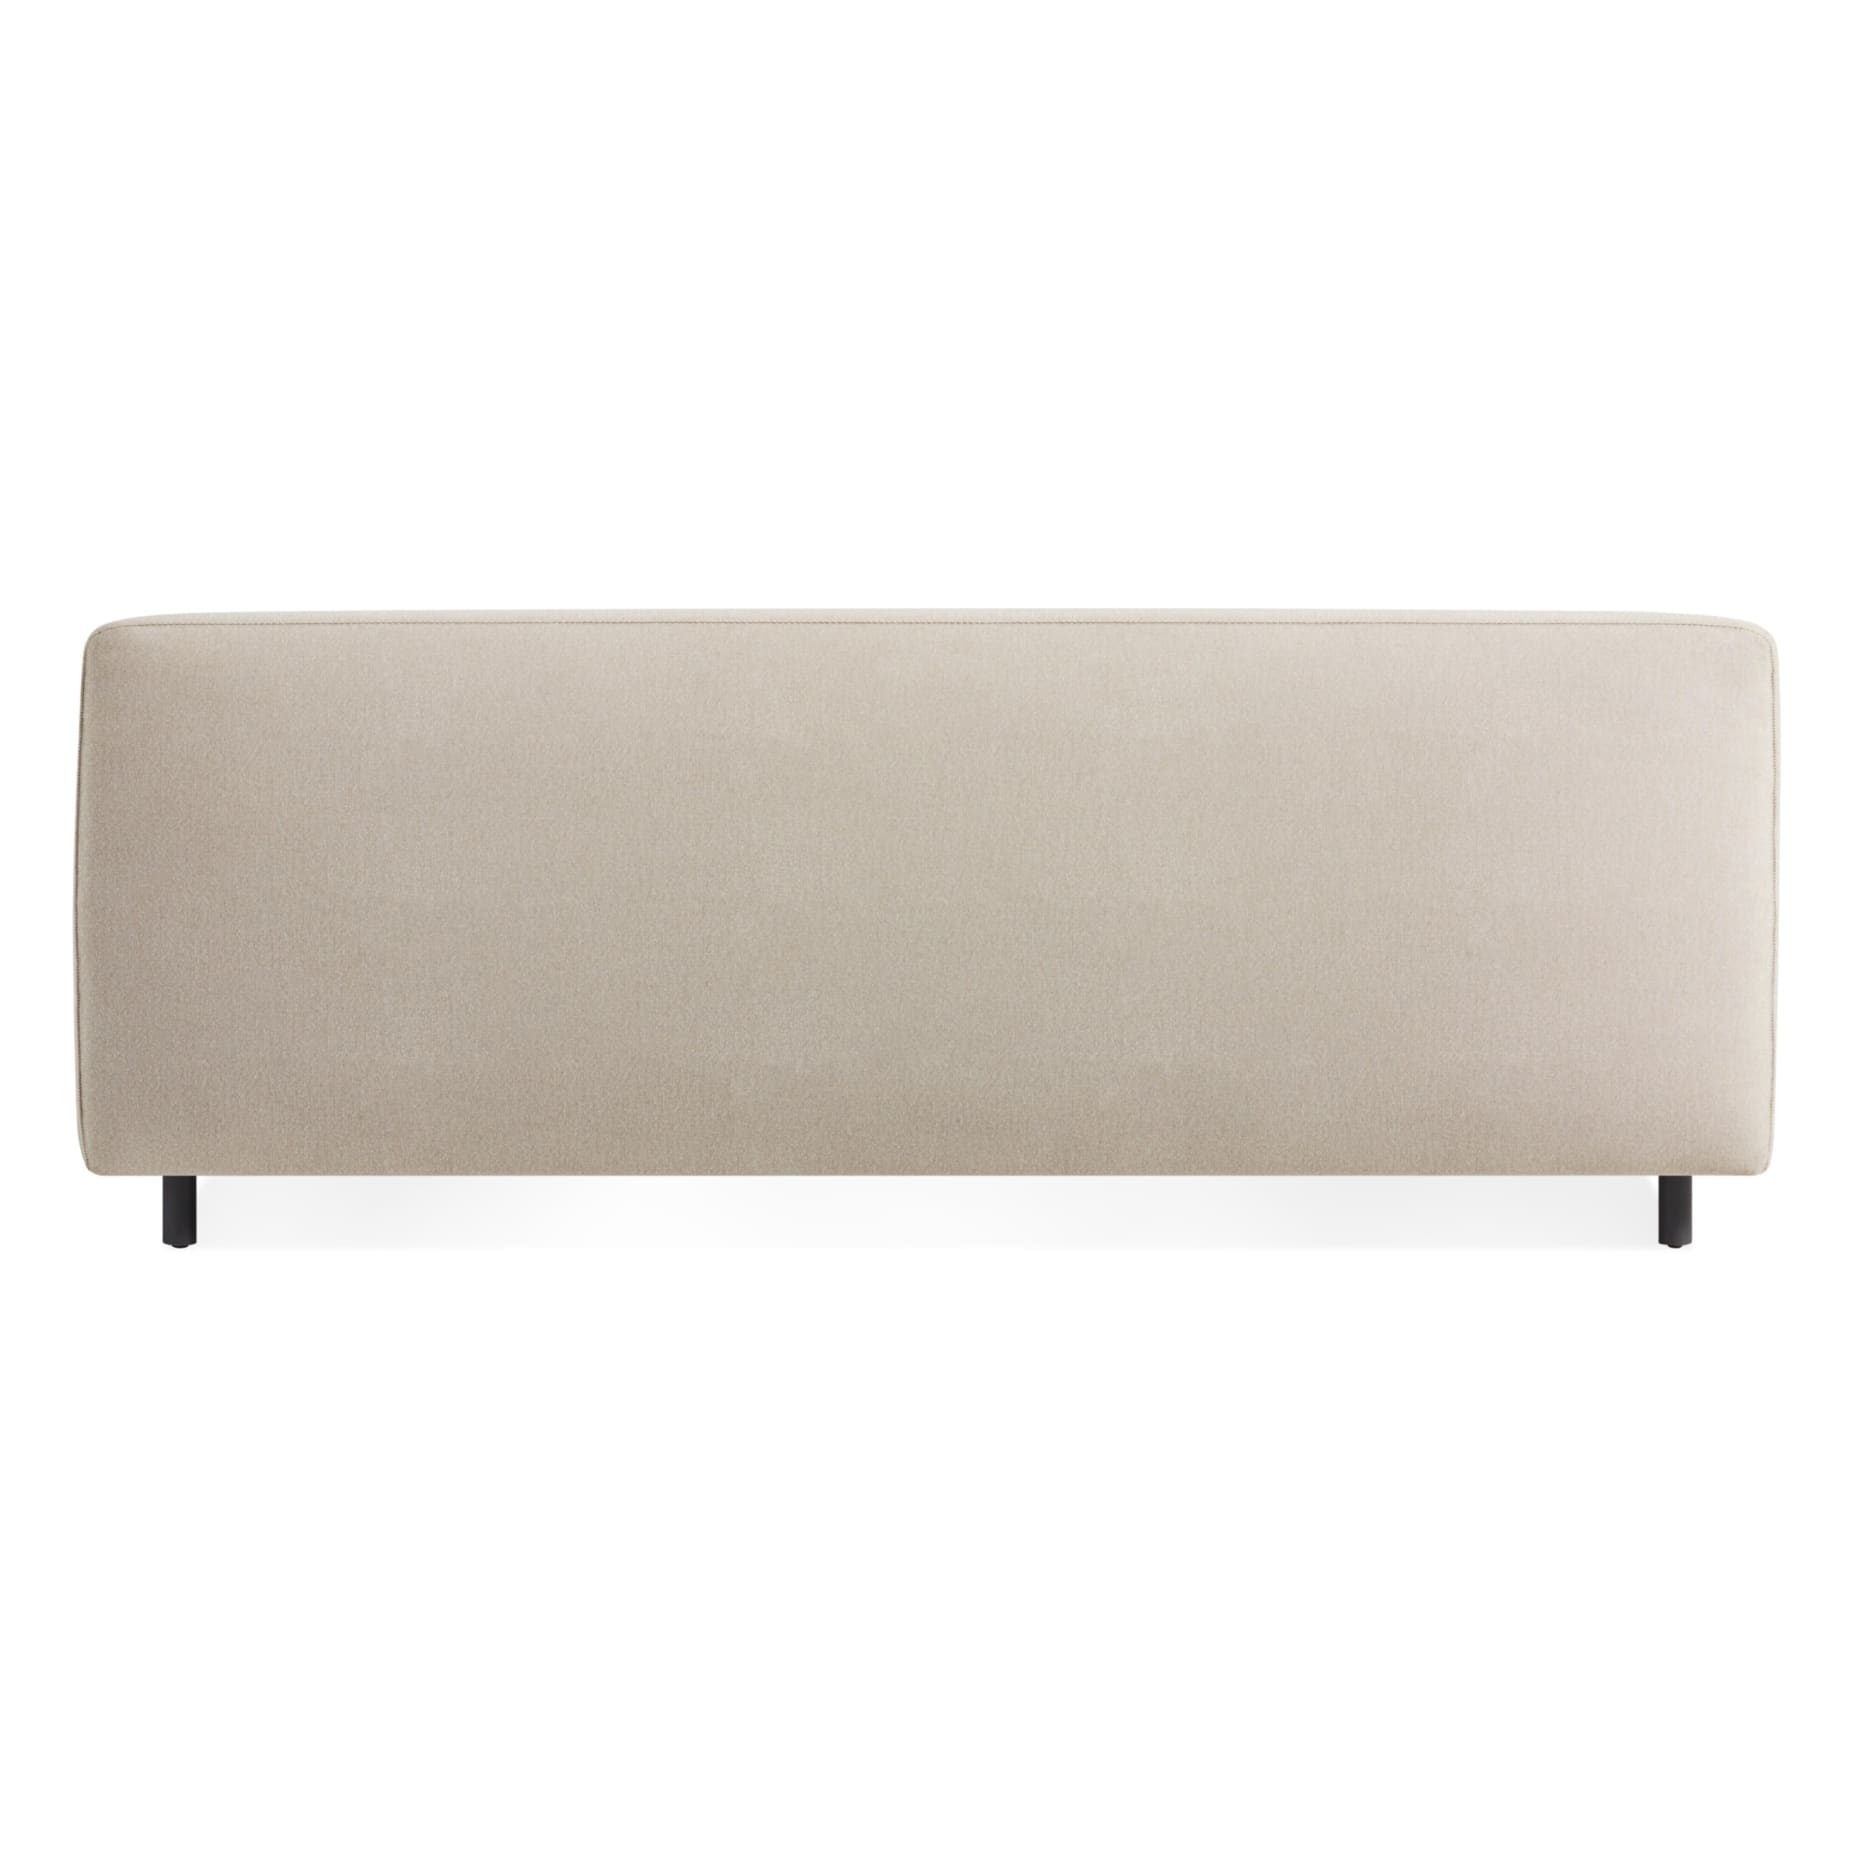 ny1 narmsf ln backlow 9 yard armless sofa sunbrella linen